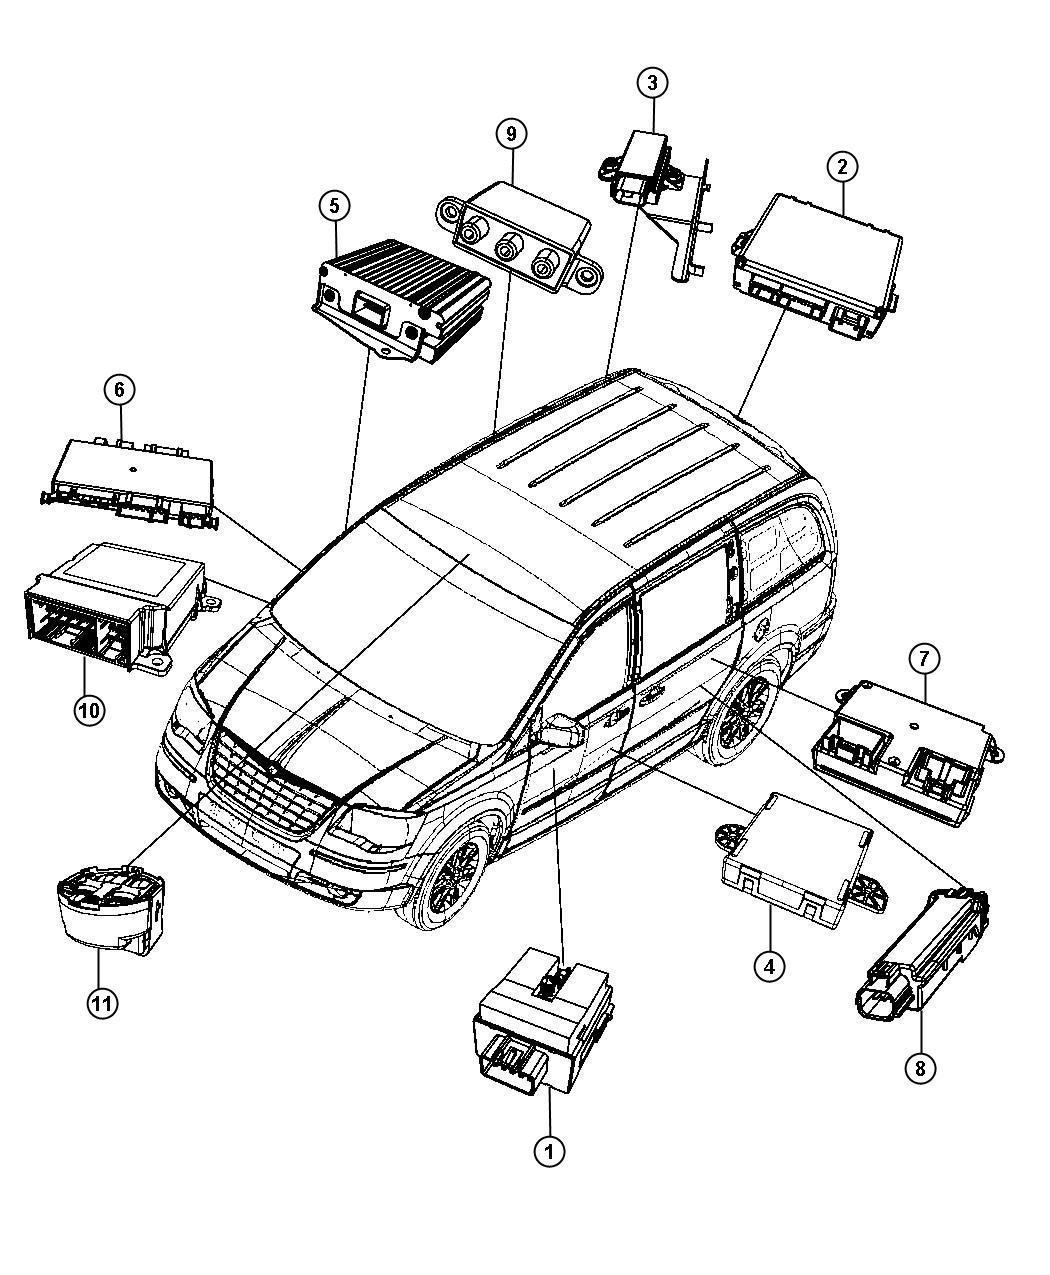 2016 Chrysler Town & Country Module. Rain sensor. Wipers